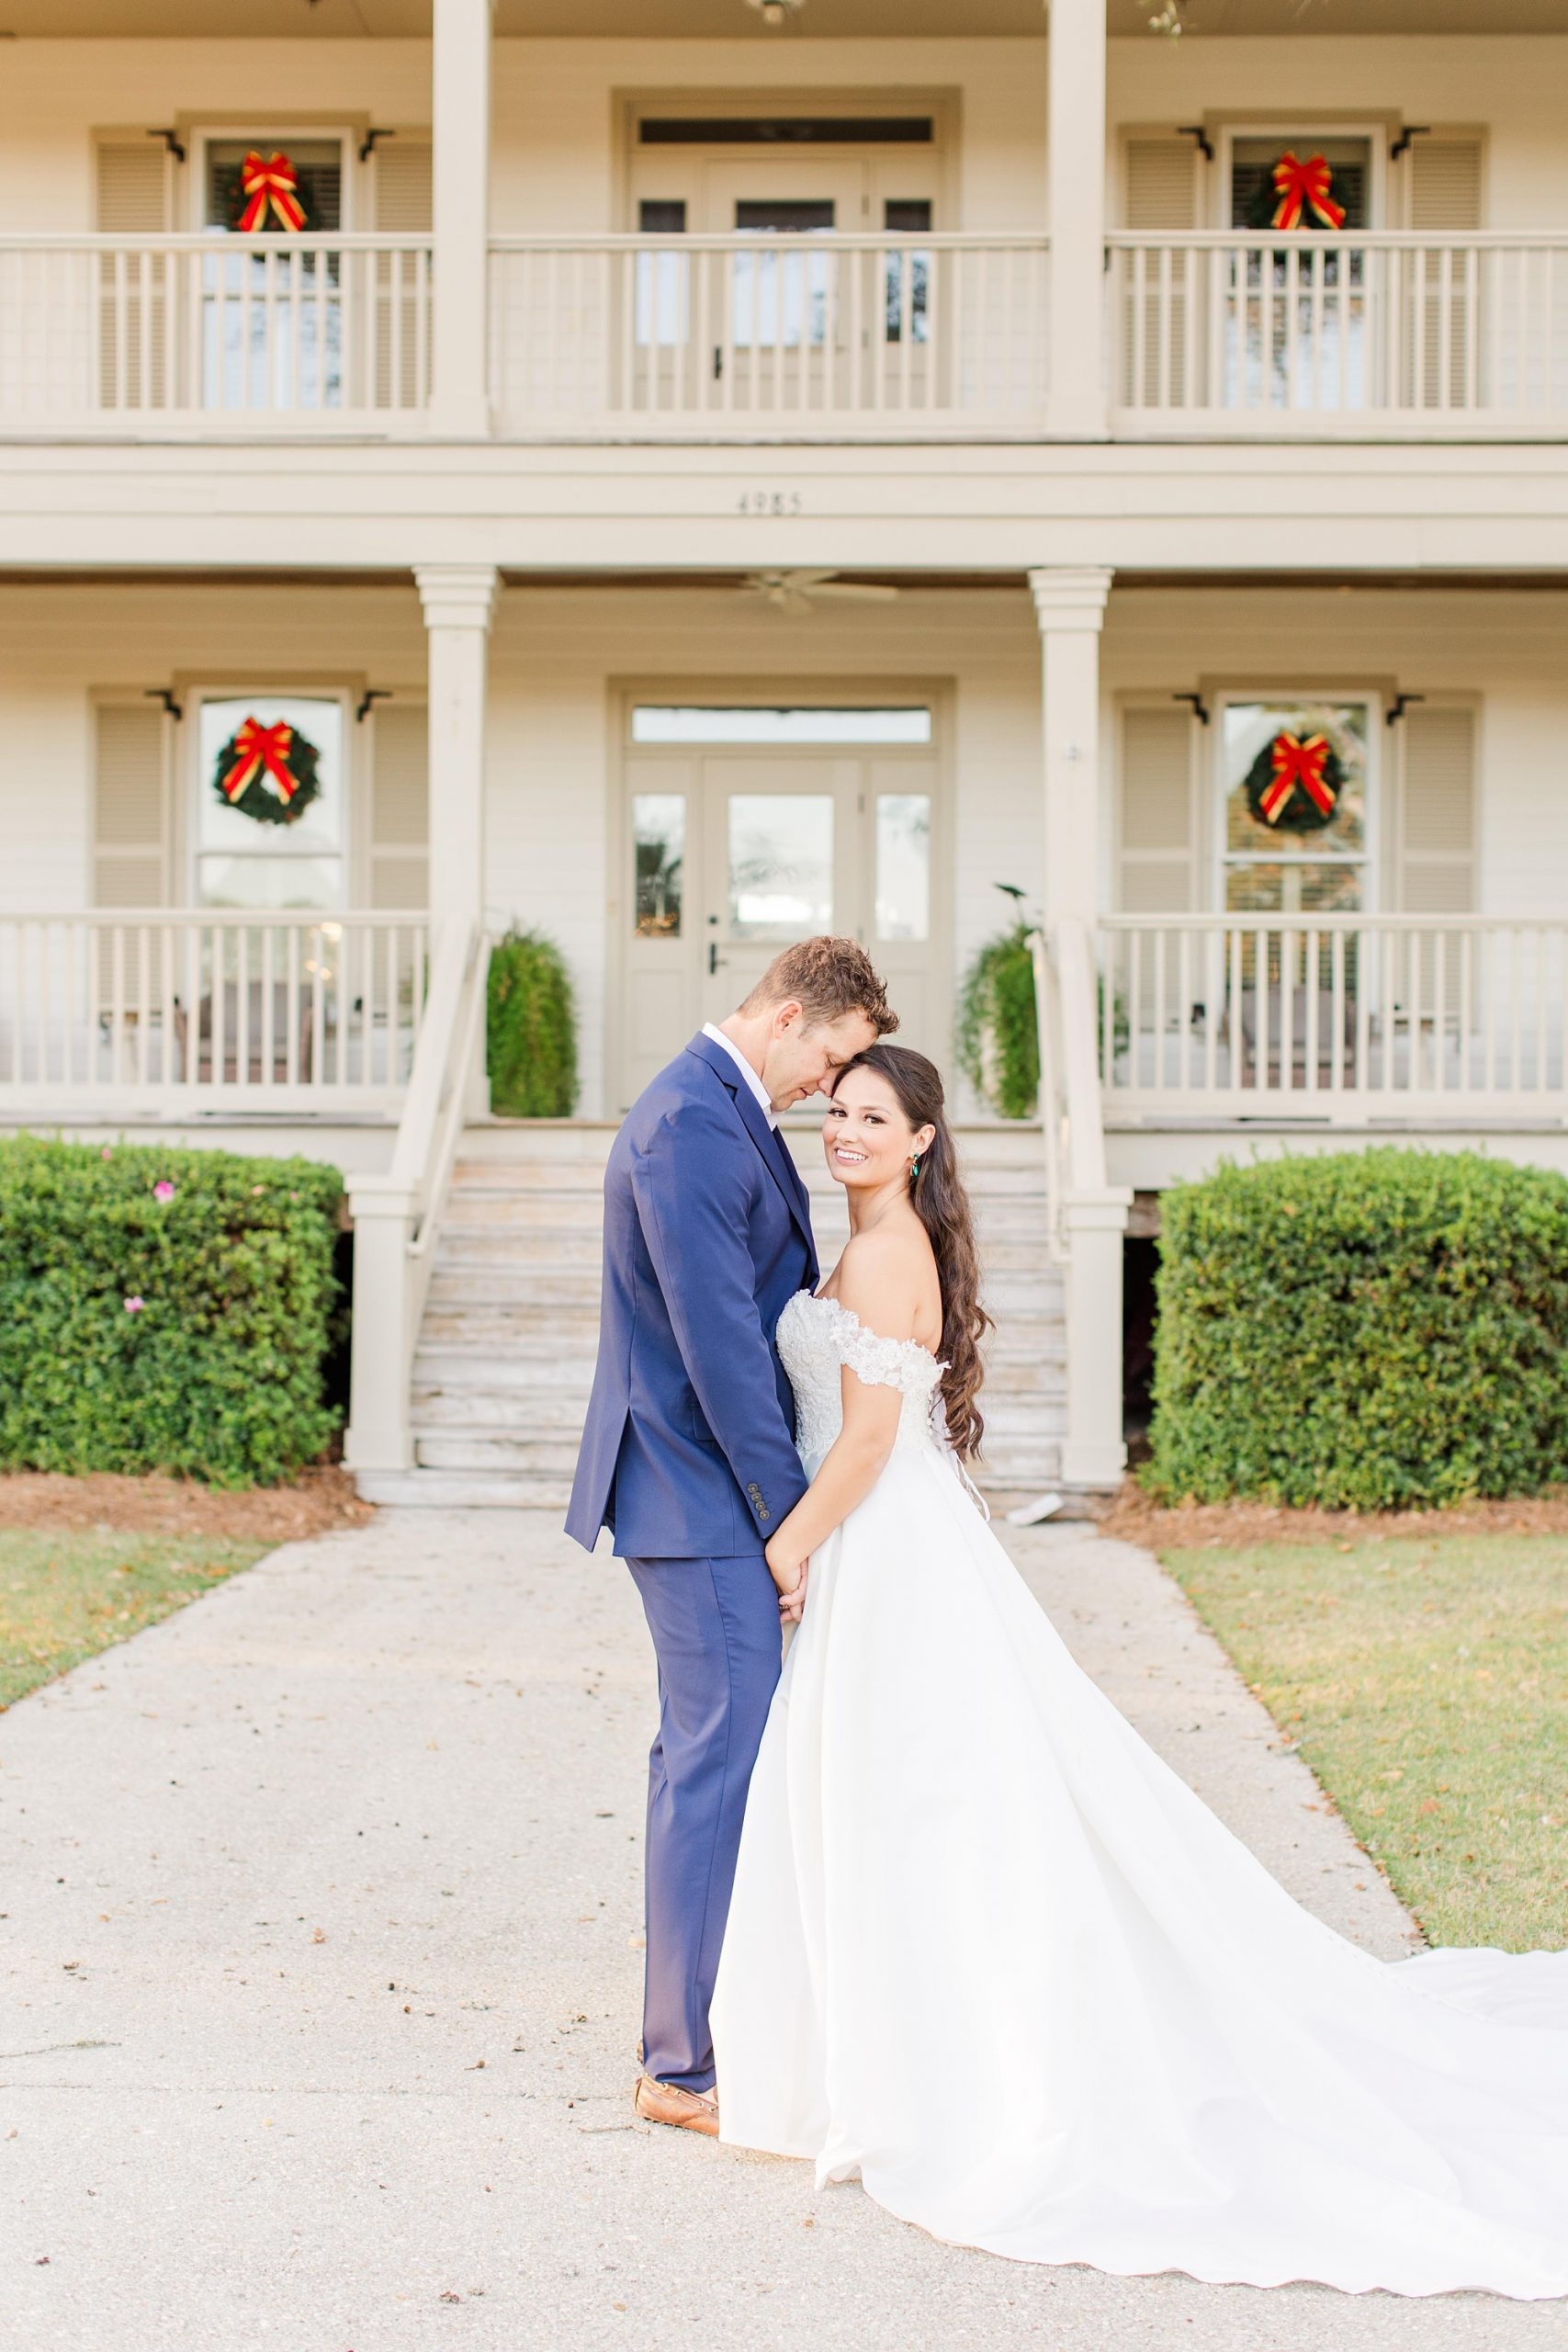 Orange Beach Al wedding photos with Christmas wreaths in backdrop